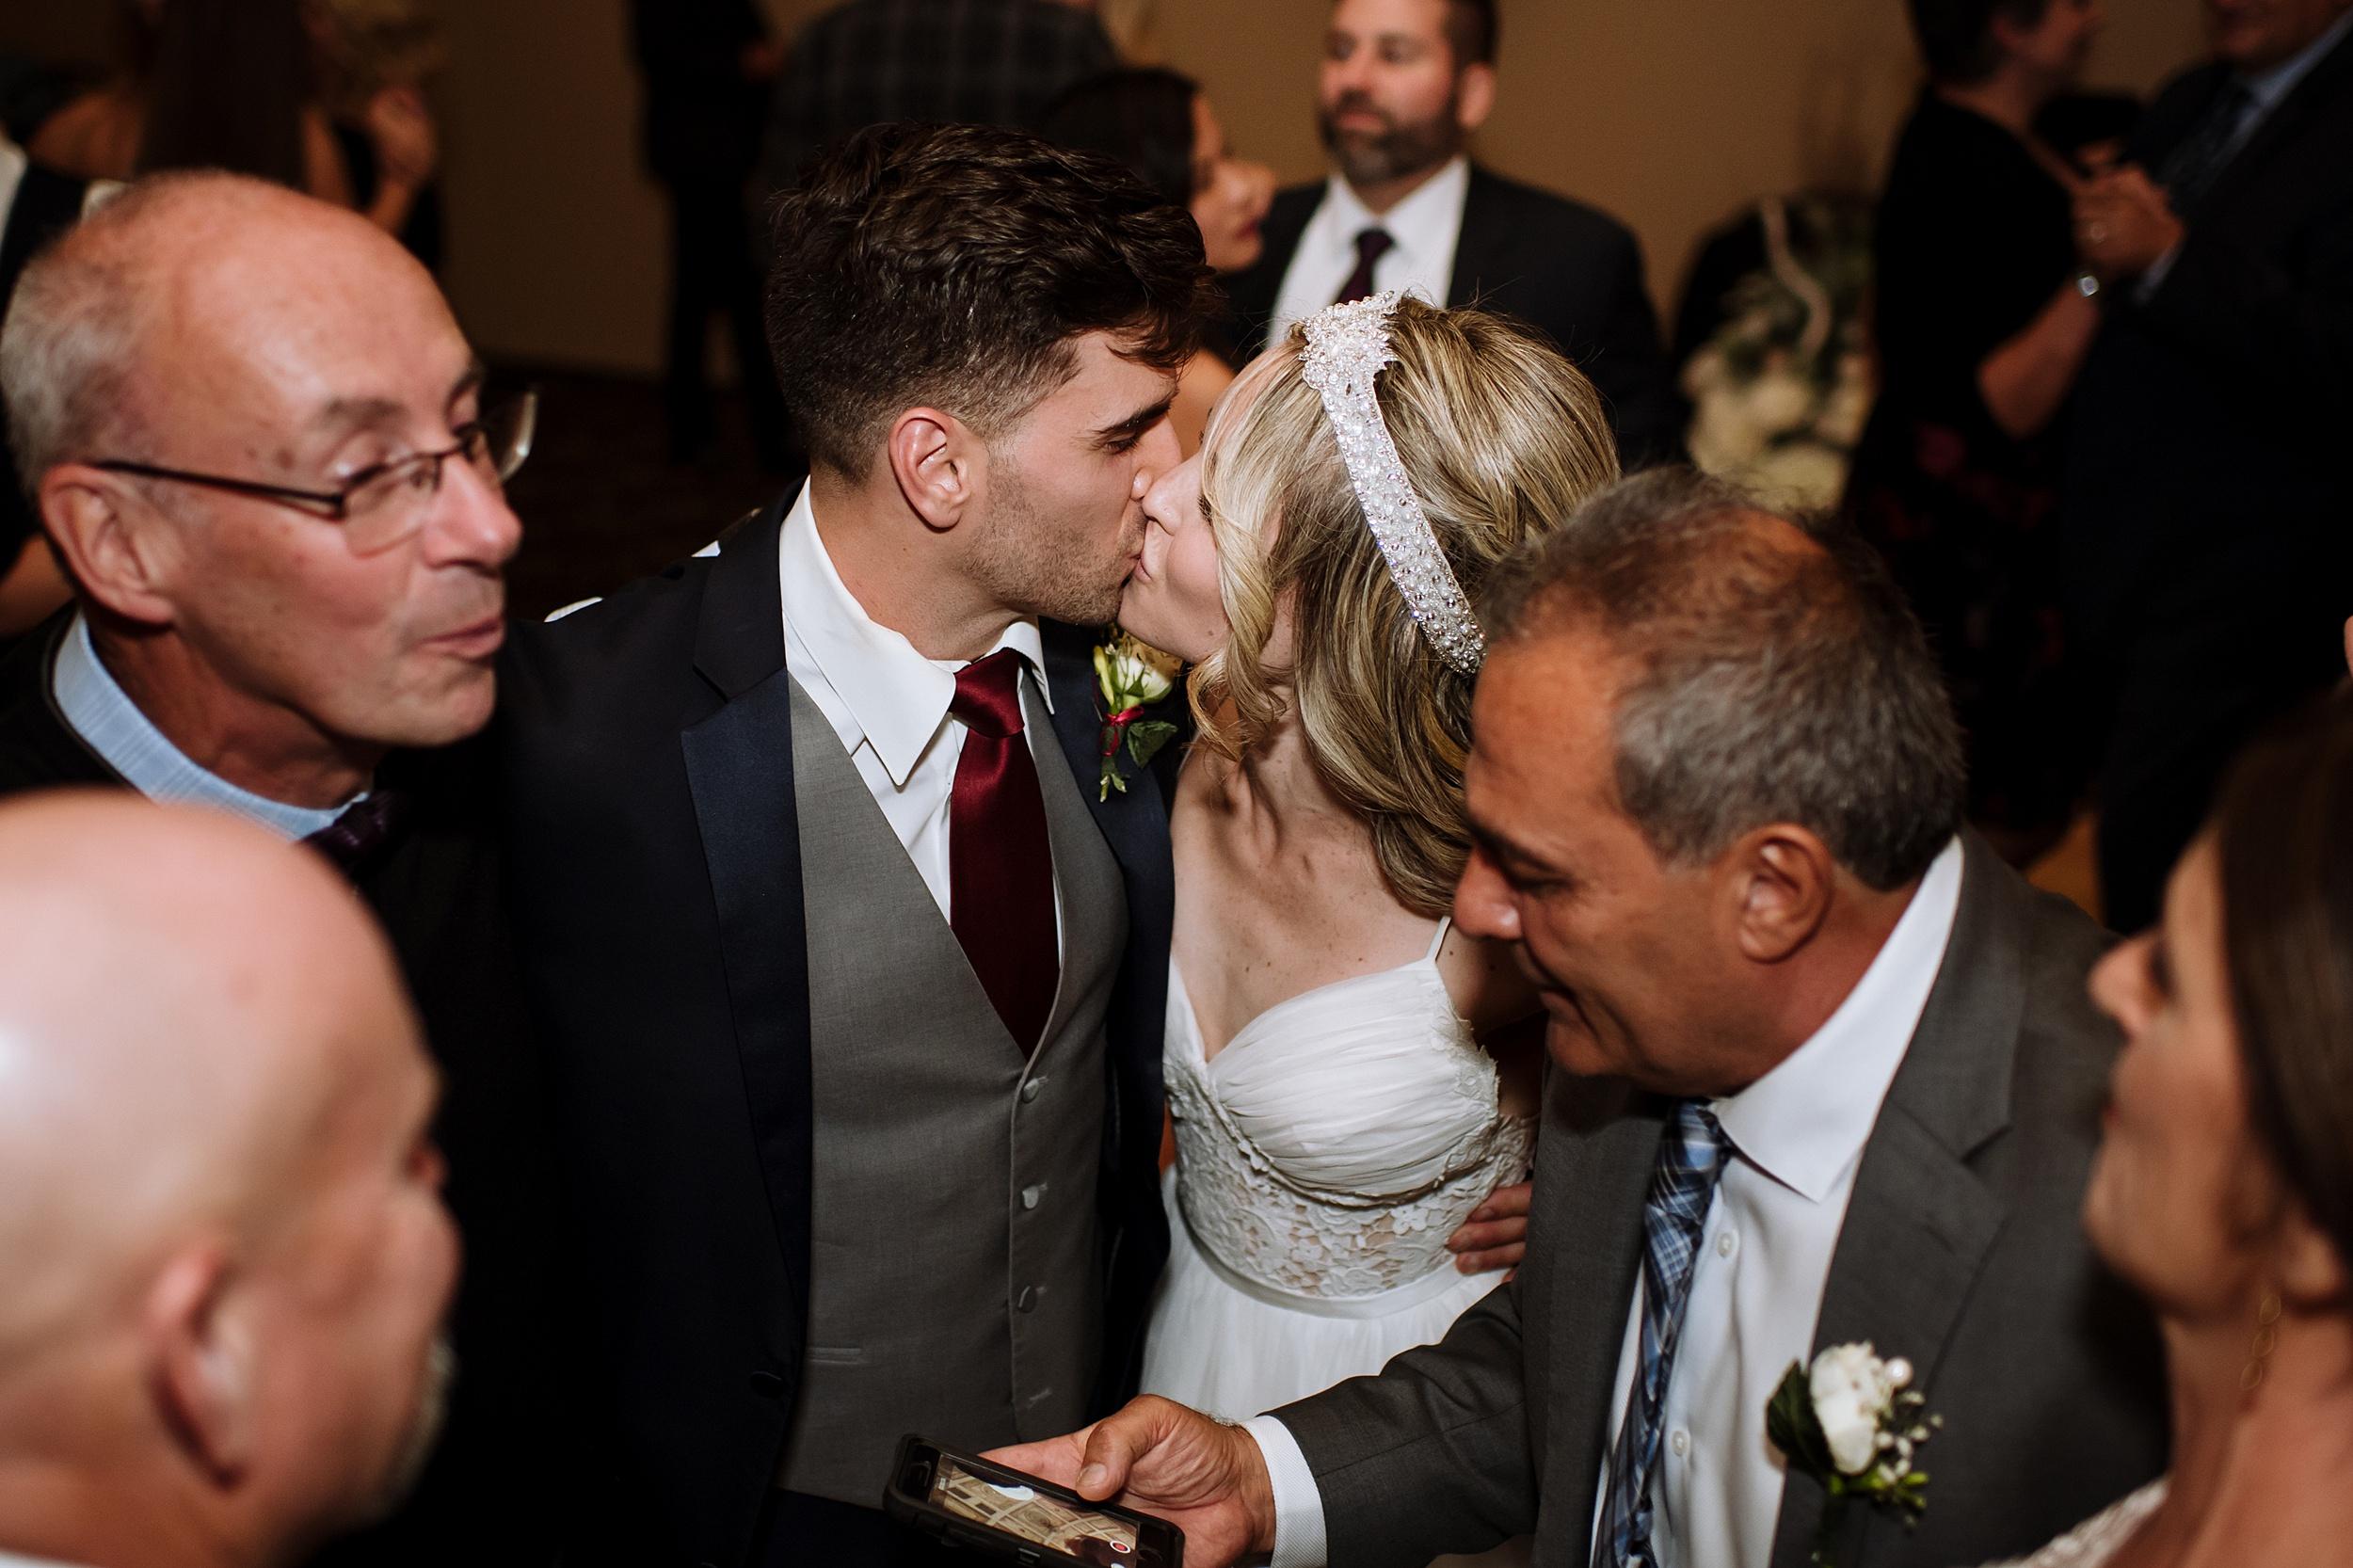 McMichael_Art_Collection_Wedding_chateau_le_jardin_Justine_Munro_Toronto_Photographer089.jpg